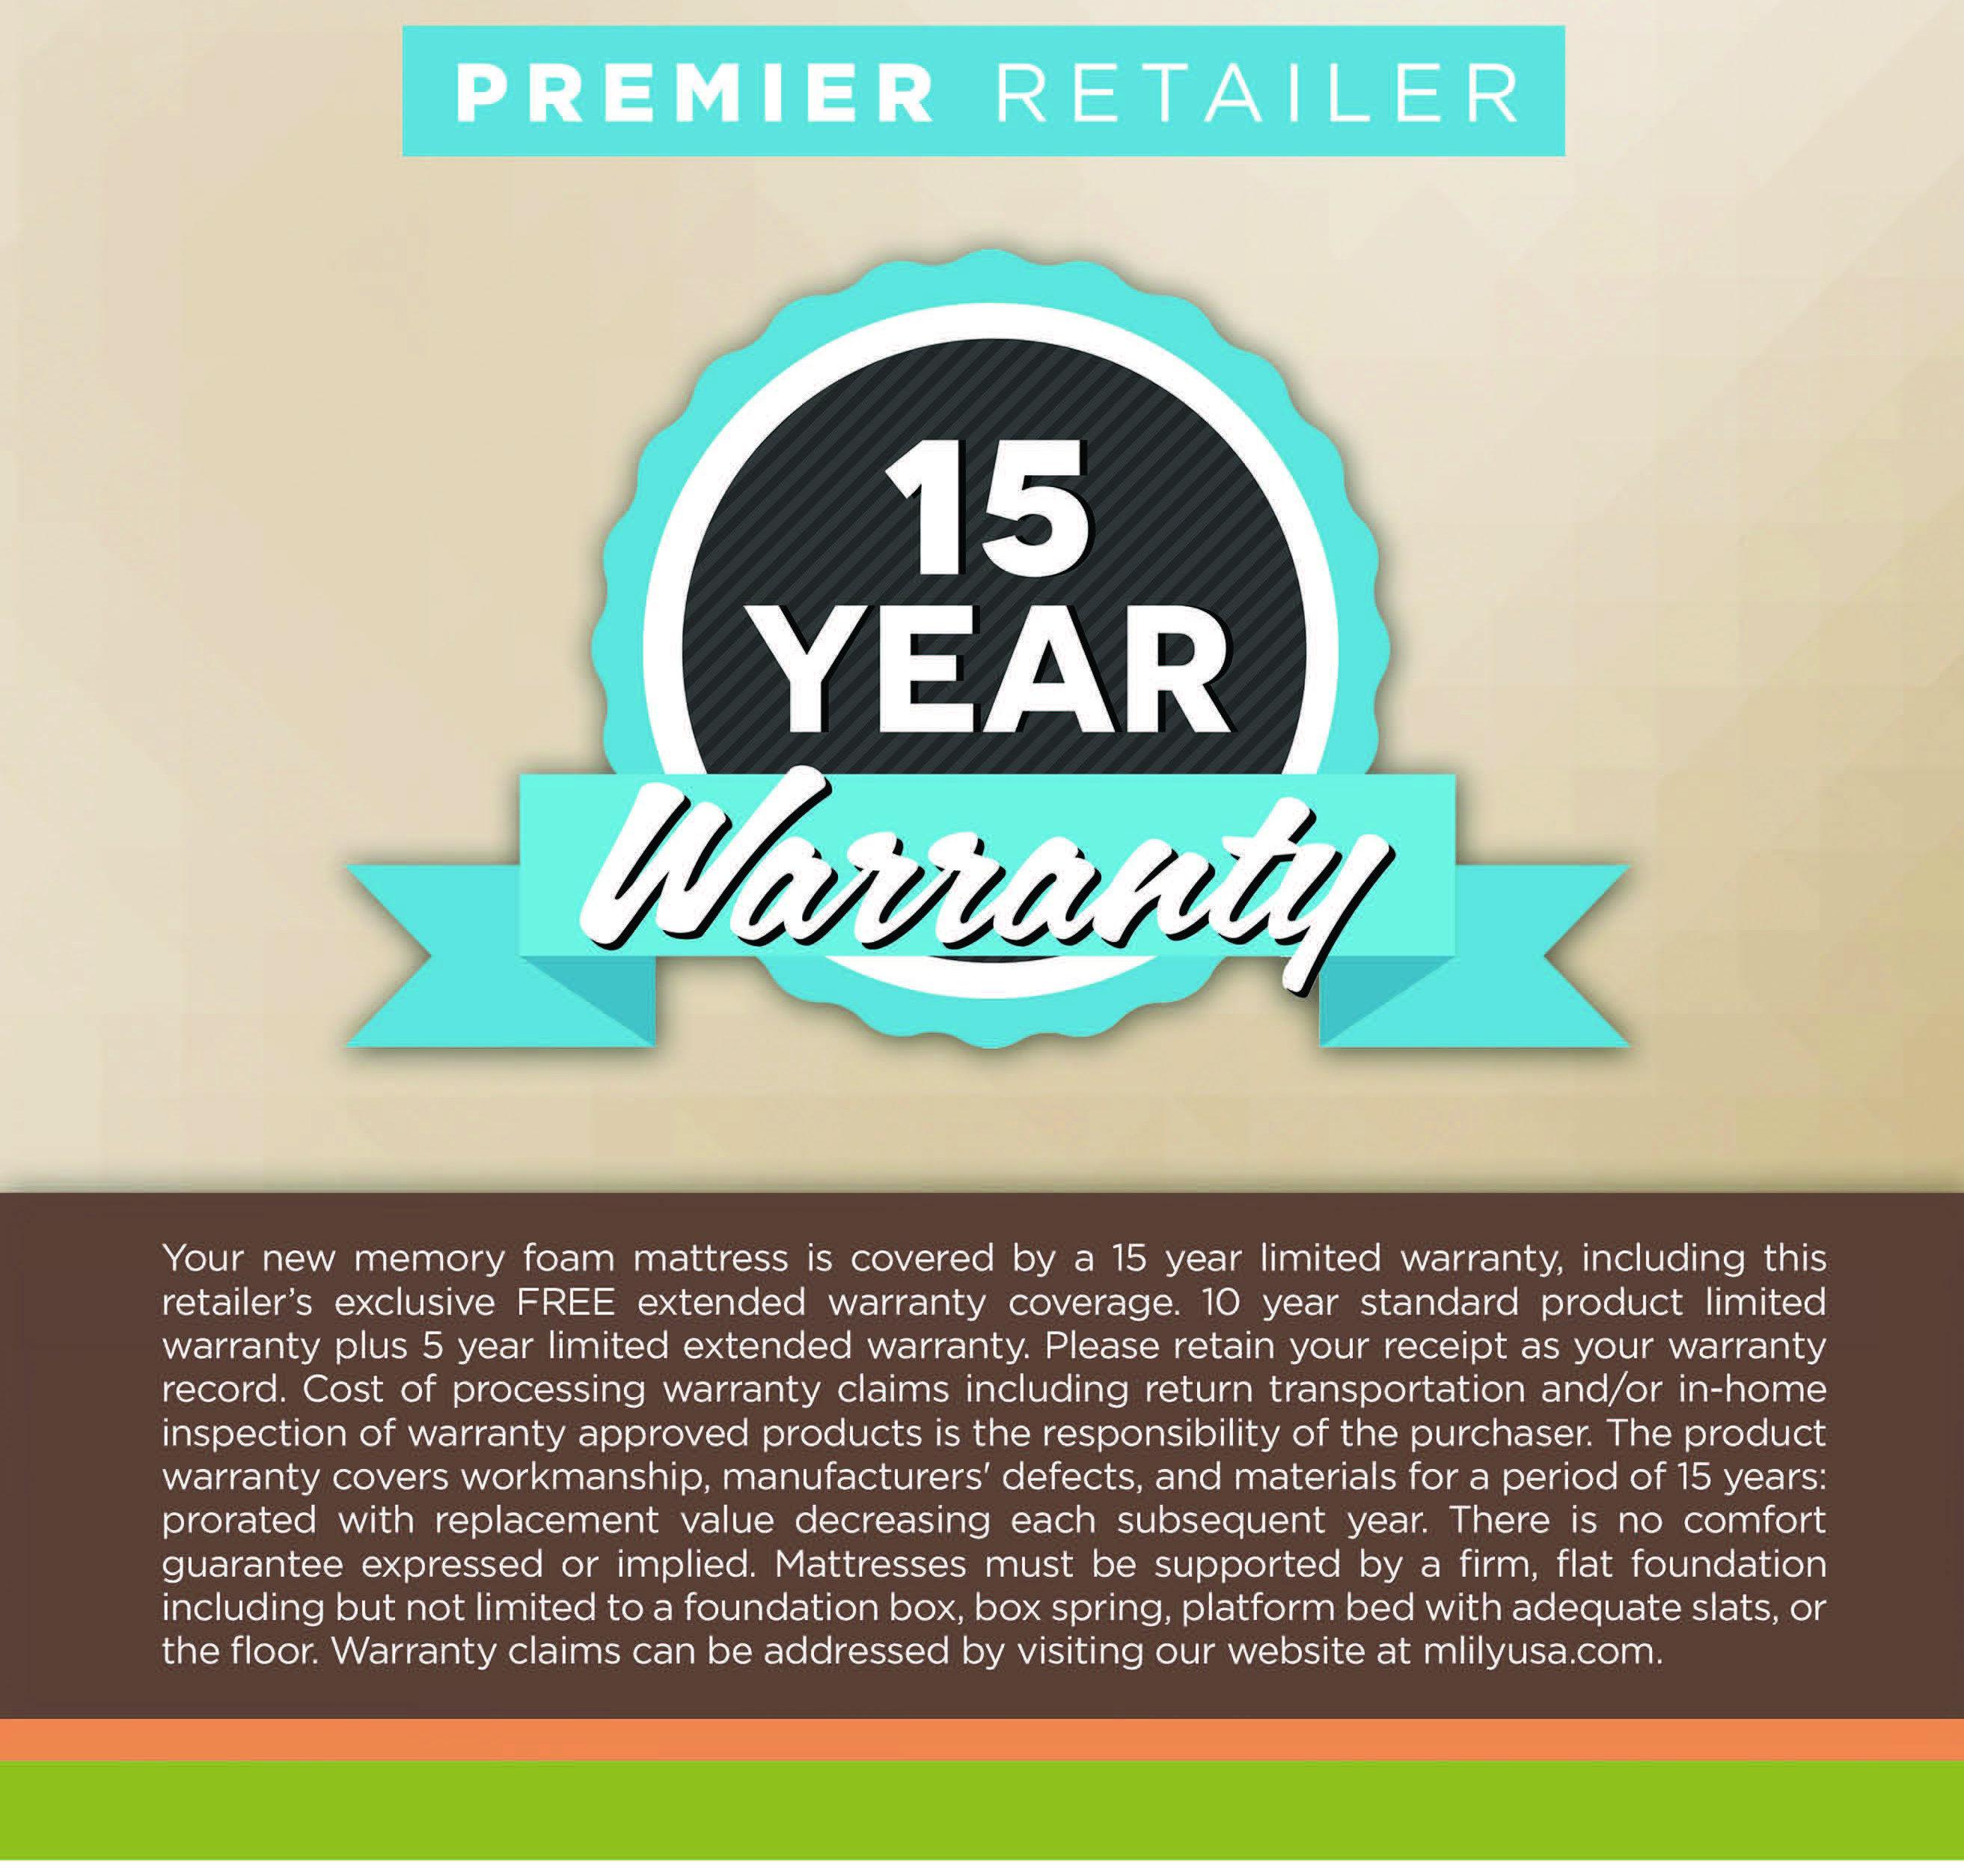 premier-retailer.jpg